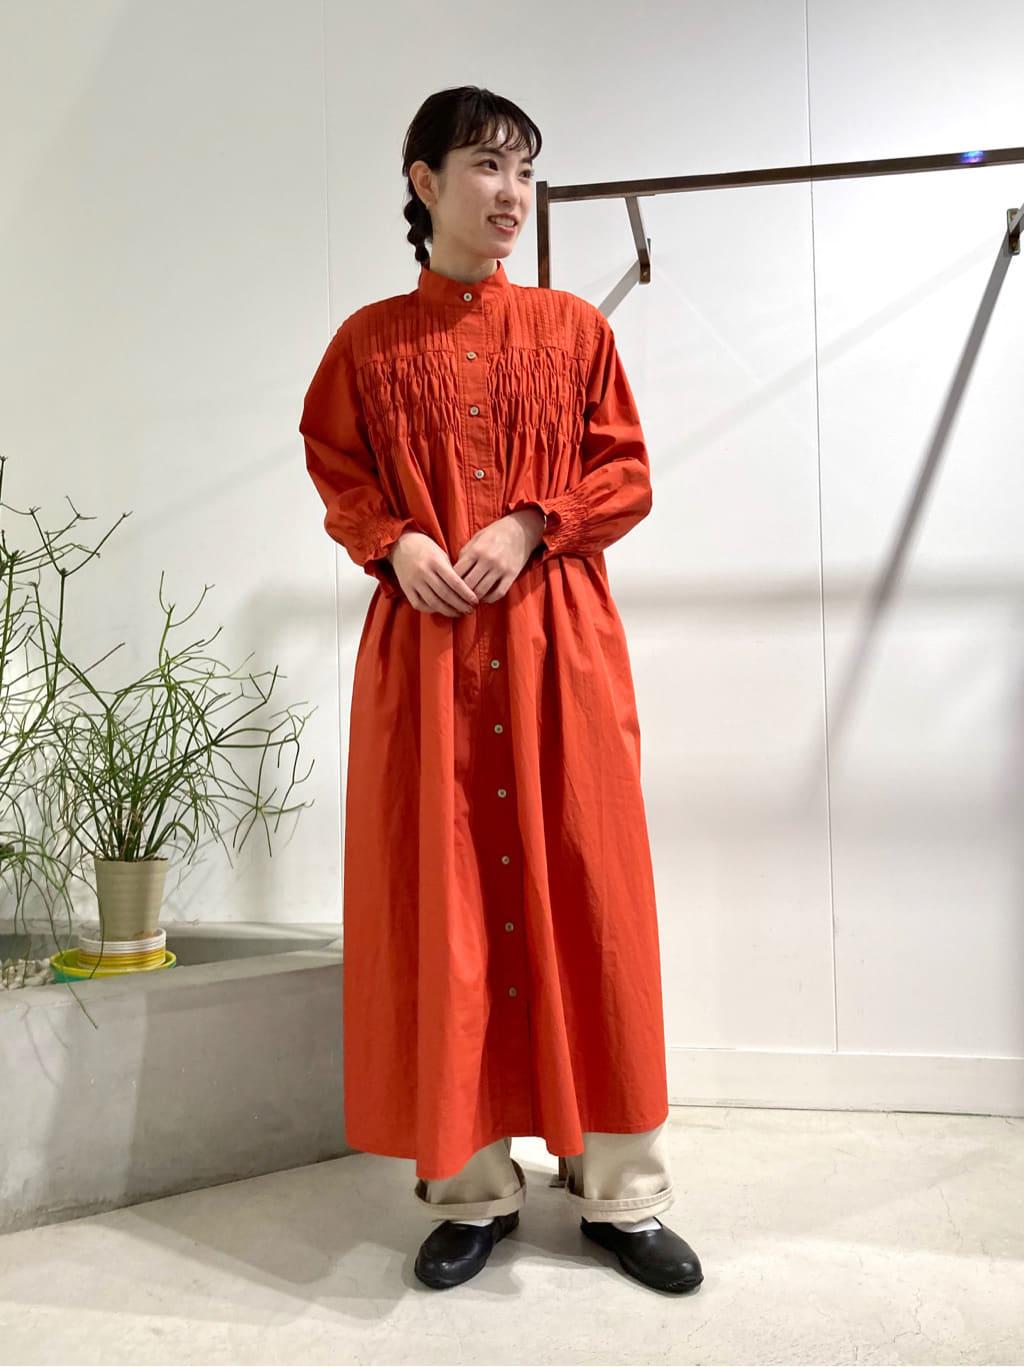 l'atelier du savon 名古屋栄路面 身長:161cm 2021.09.29